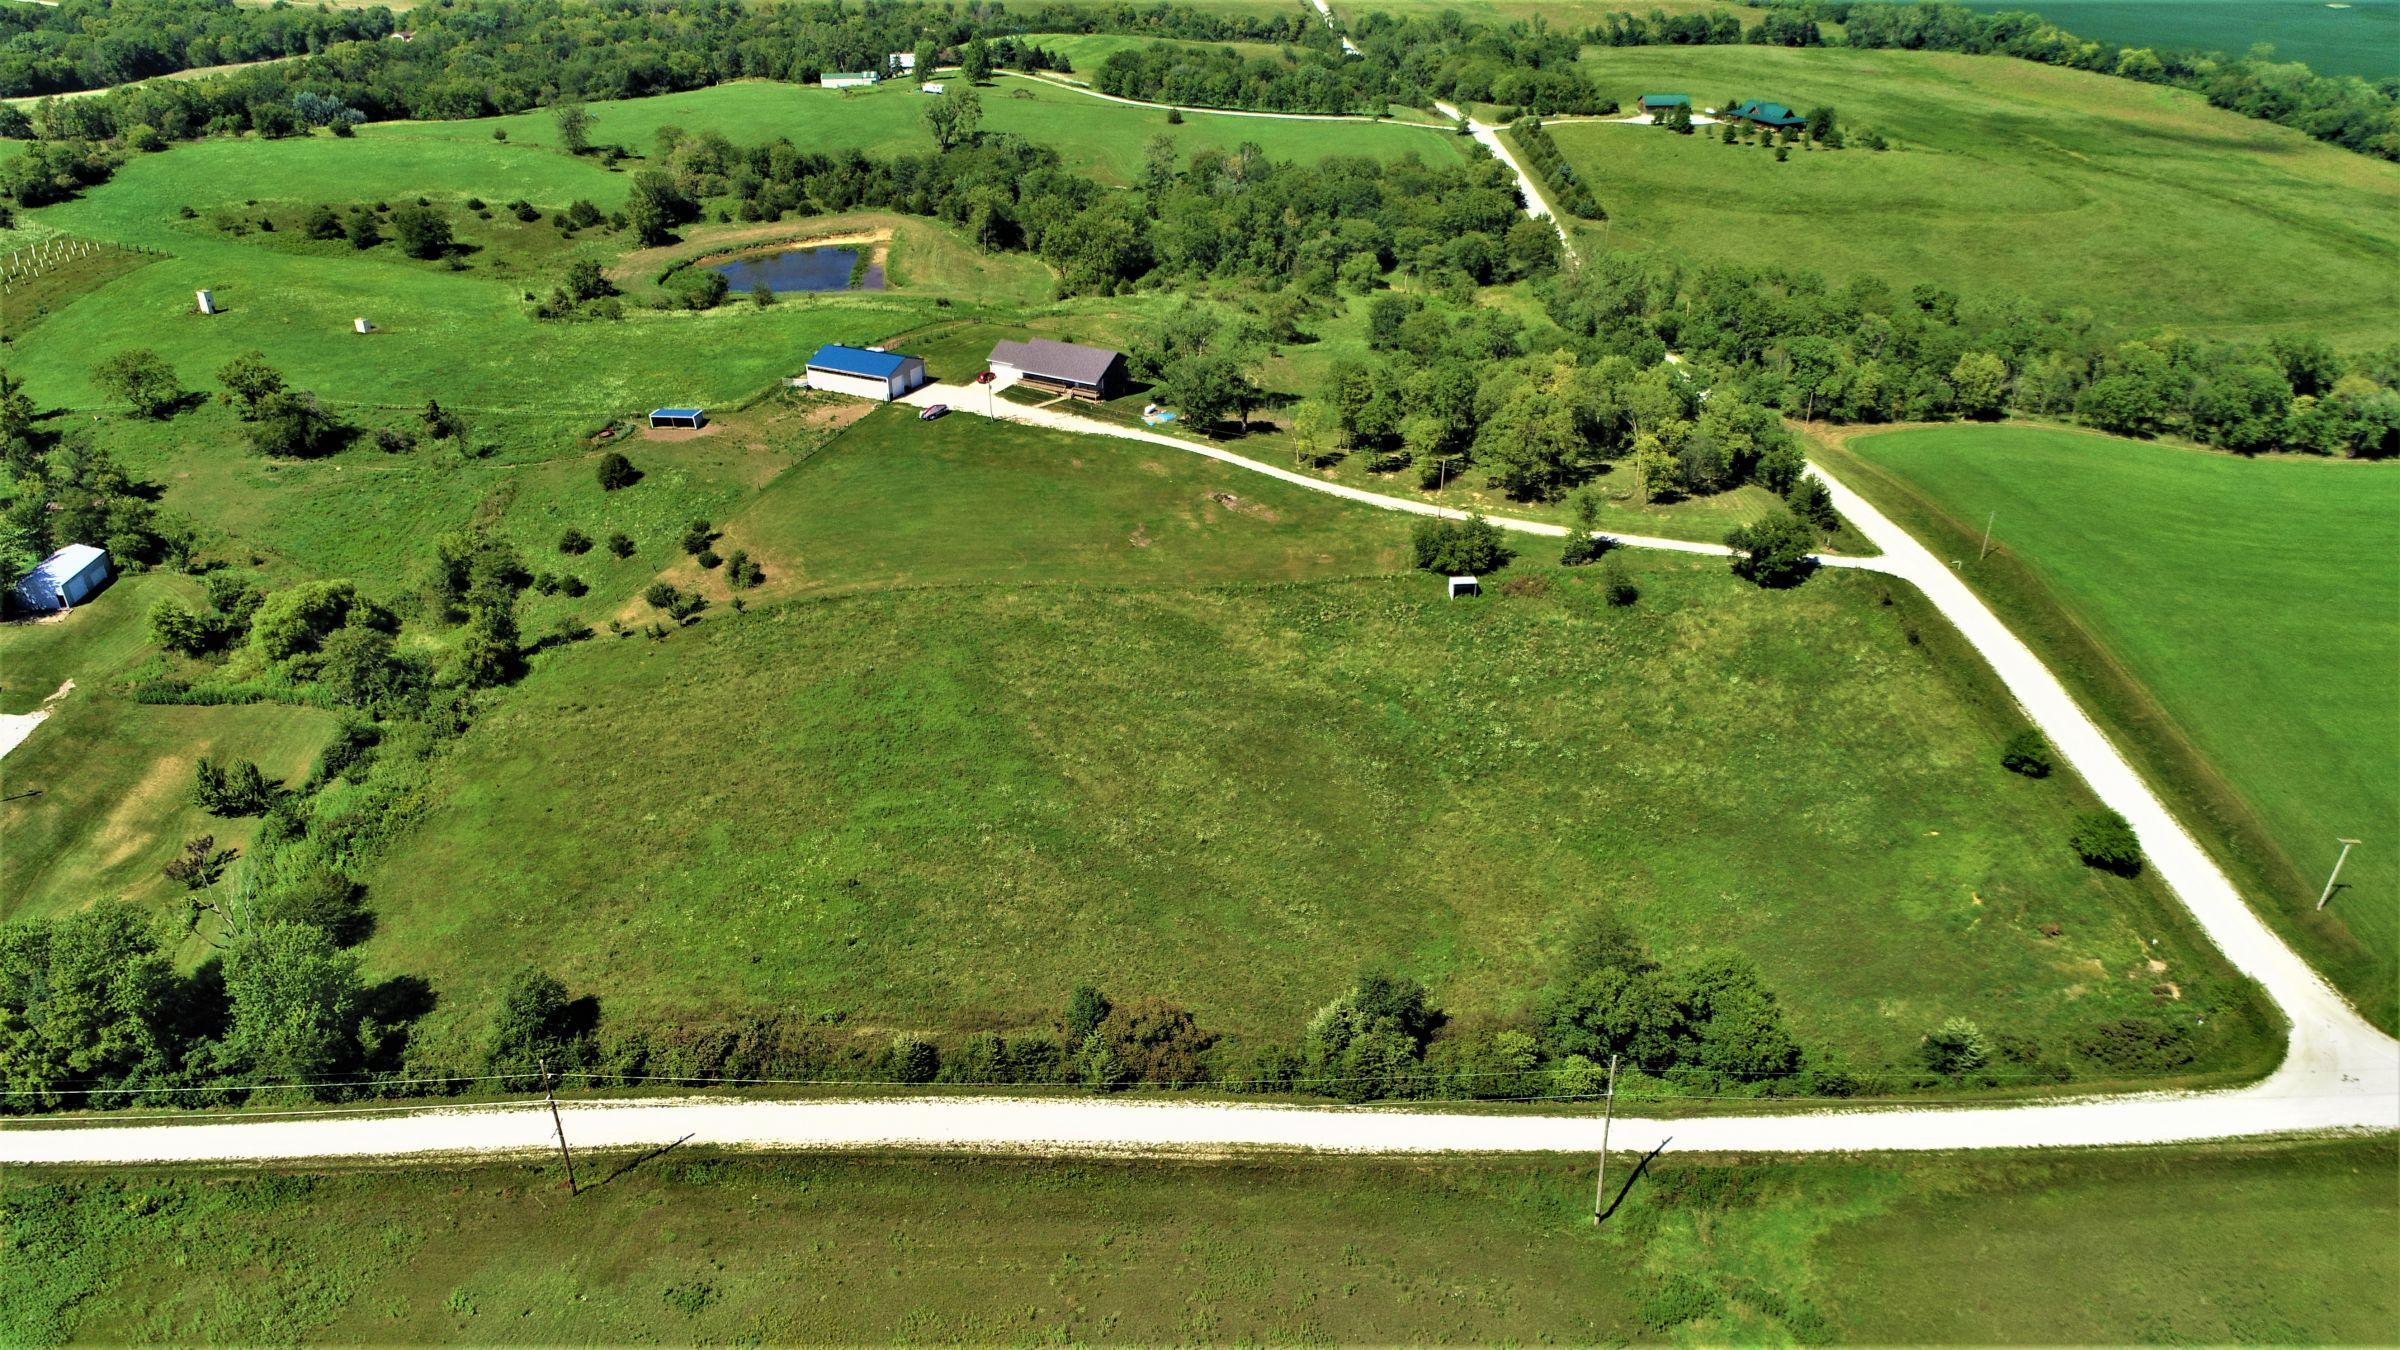 land-warren-county-iowa-6-acres-listing-number-15709-12-2021-08-27-202018.JPG